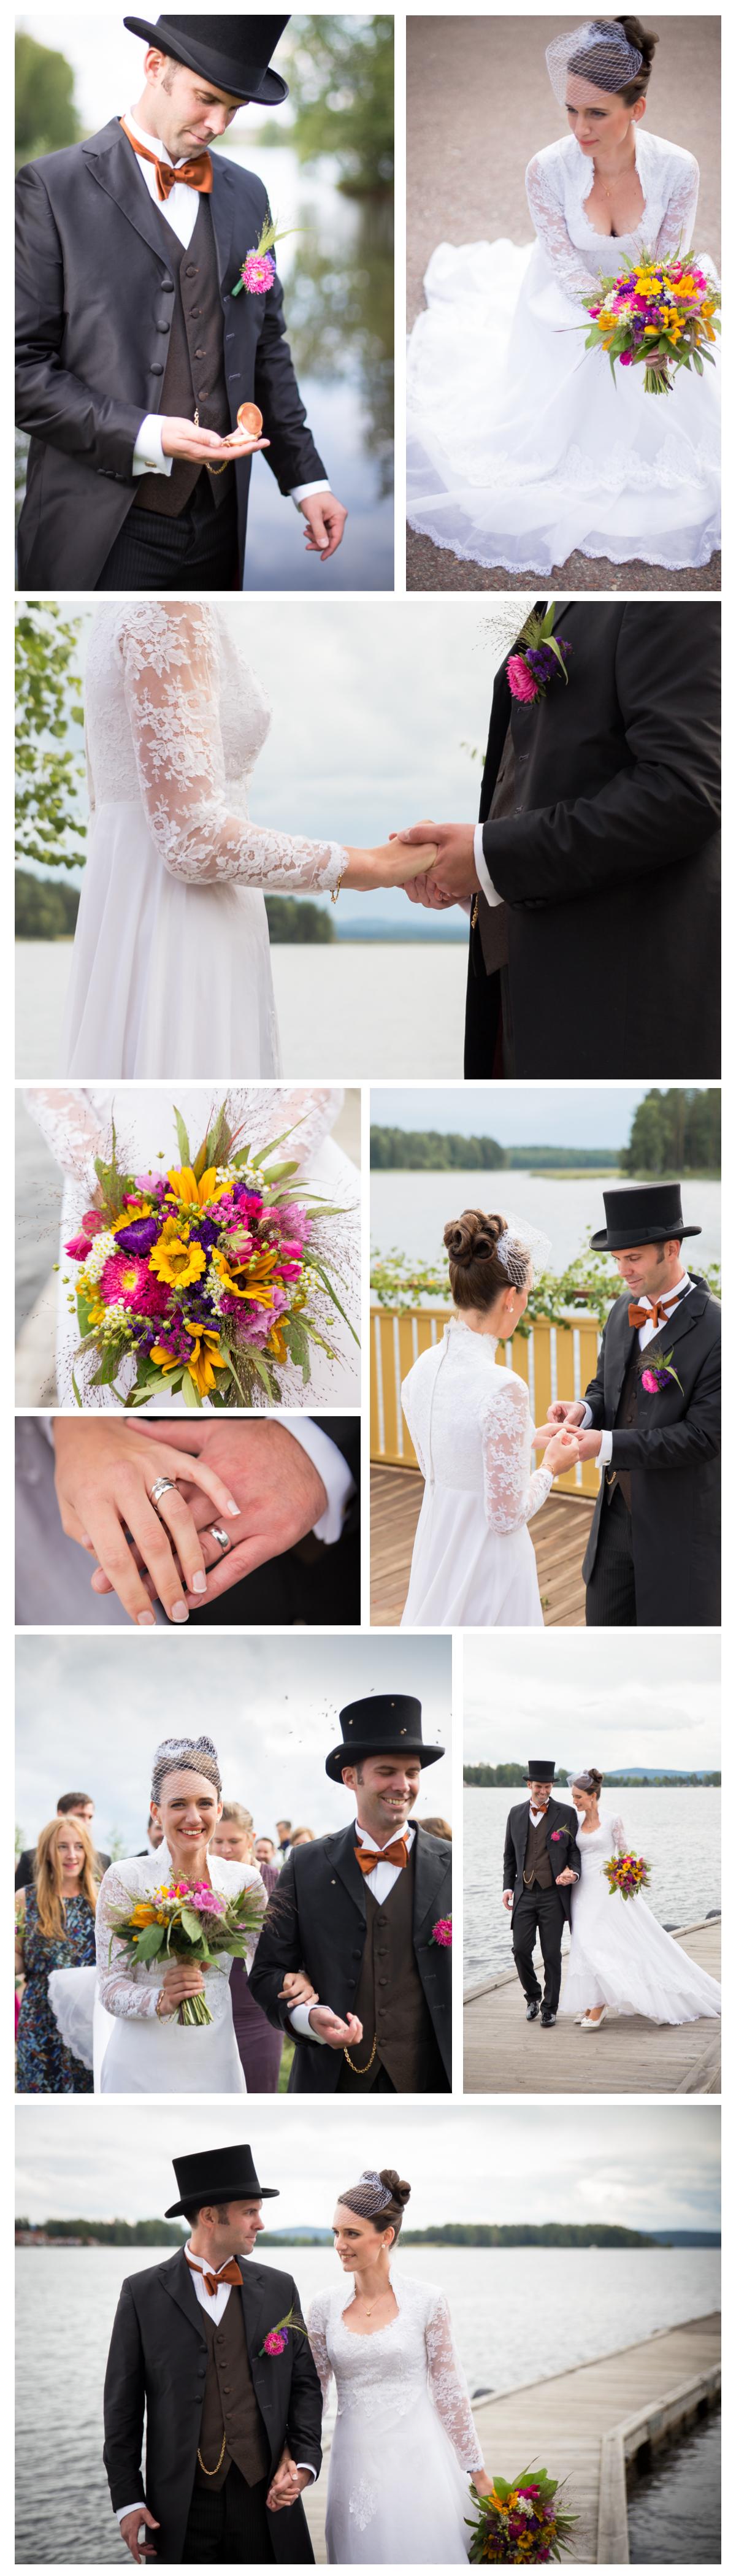 Bröllopsfotografering Falun Dalarna Fru Thorsell Fotografi